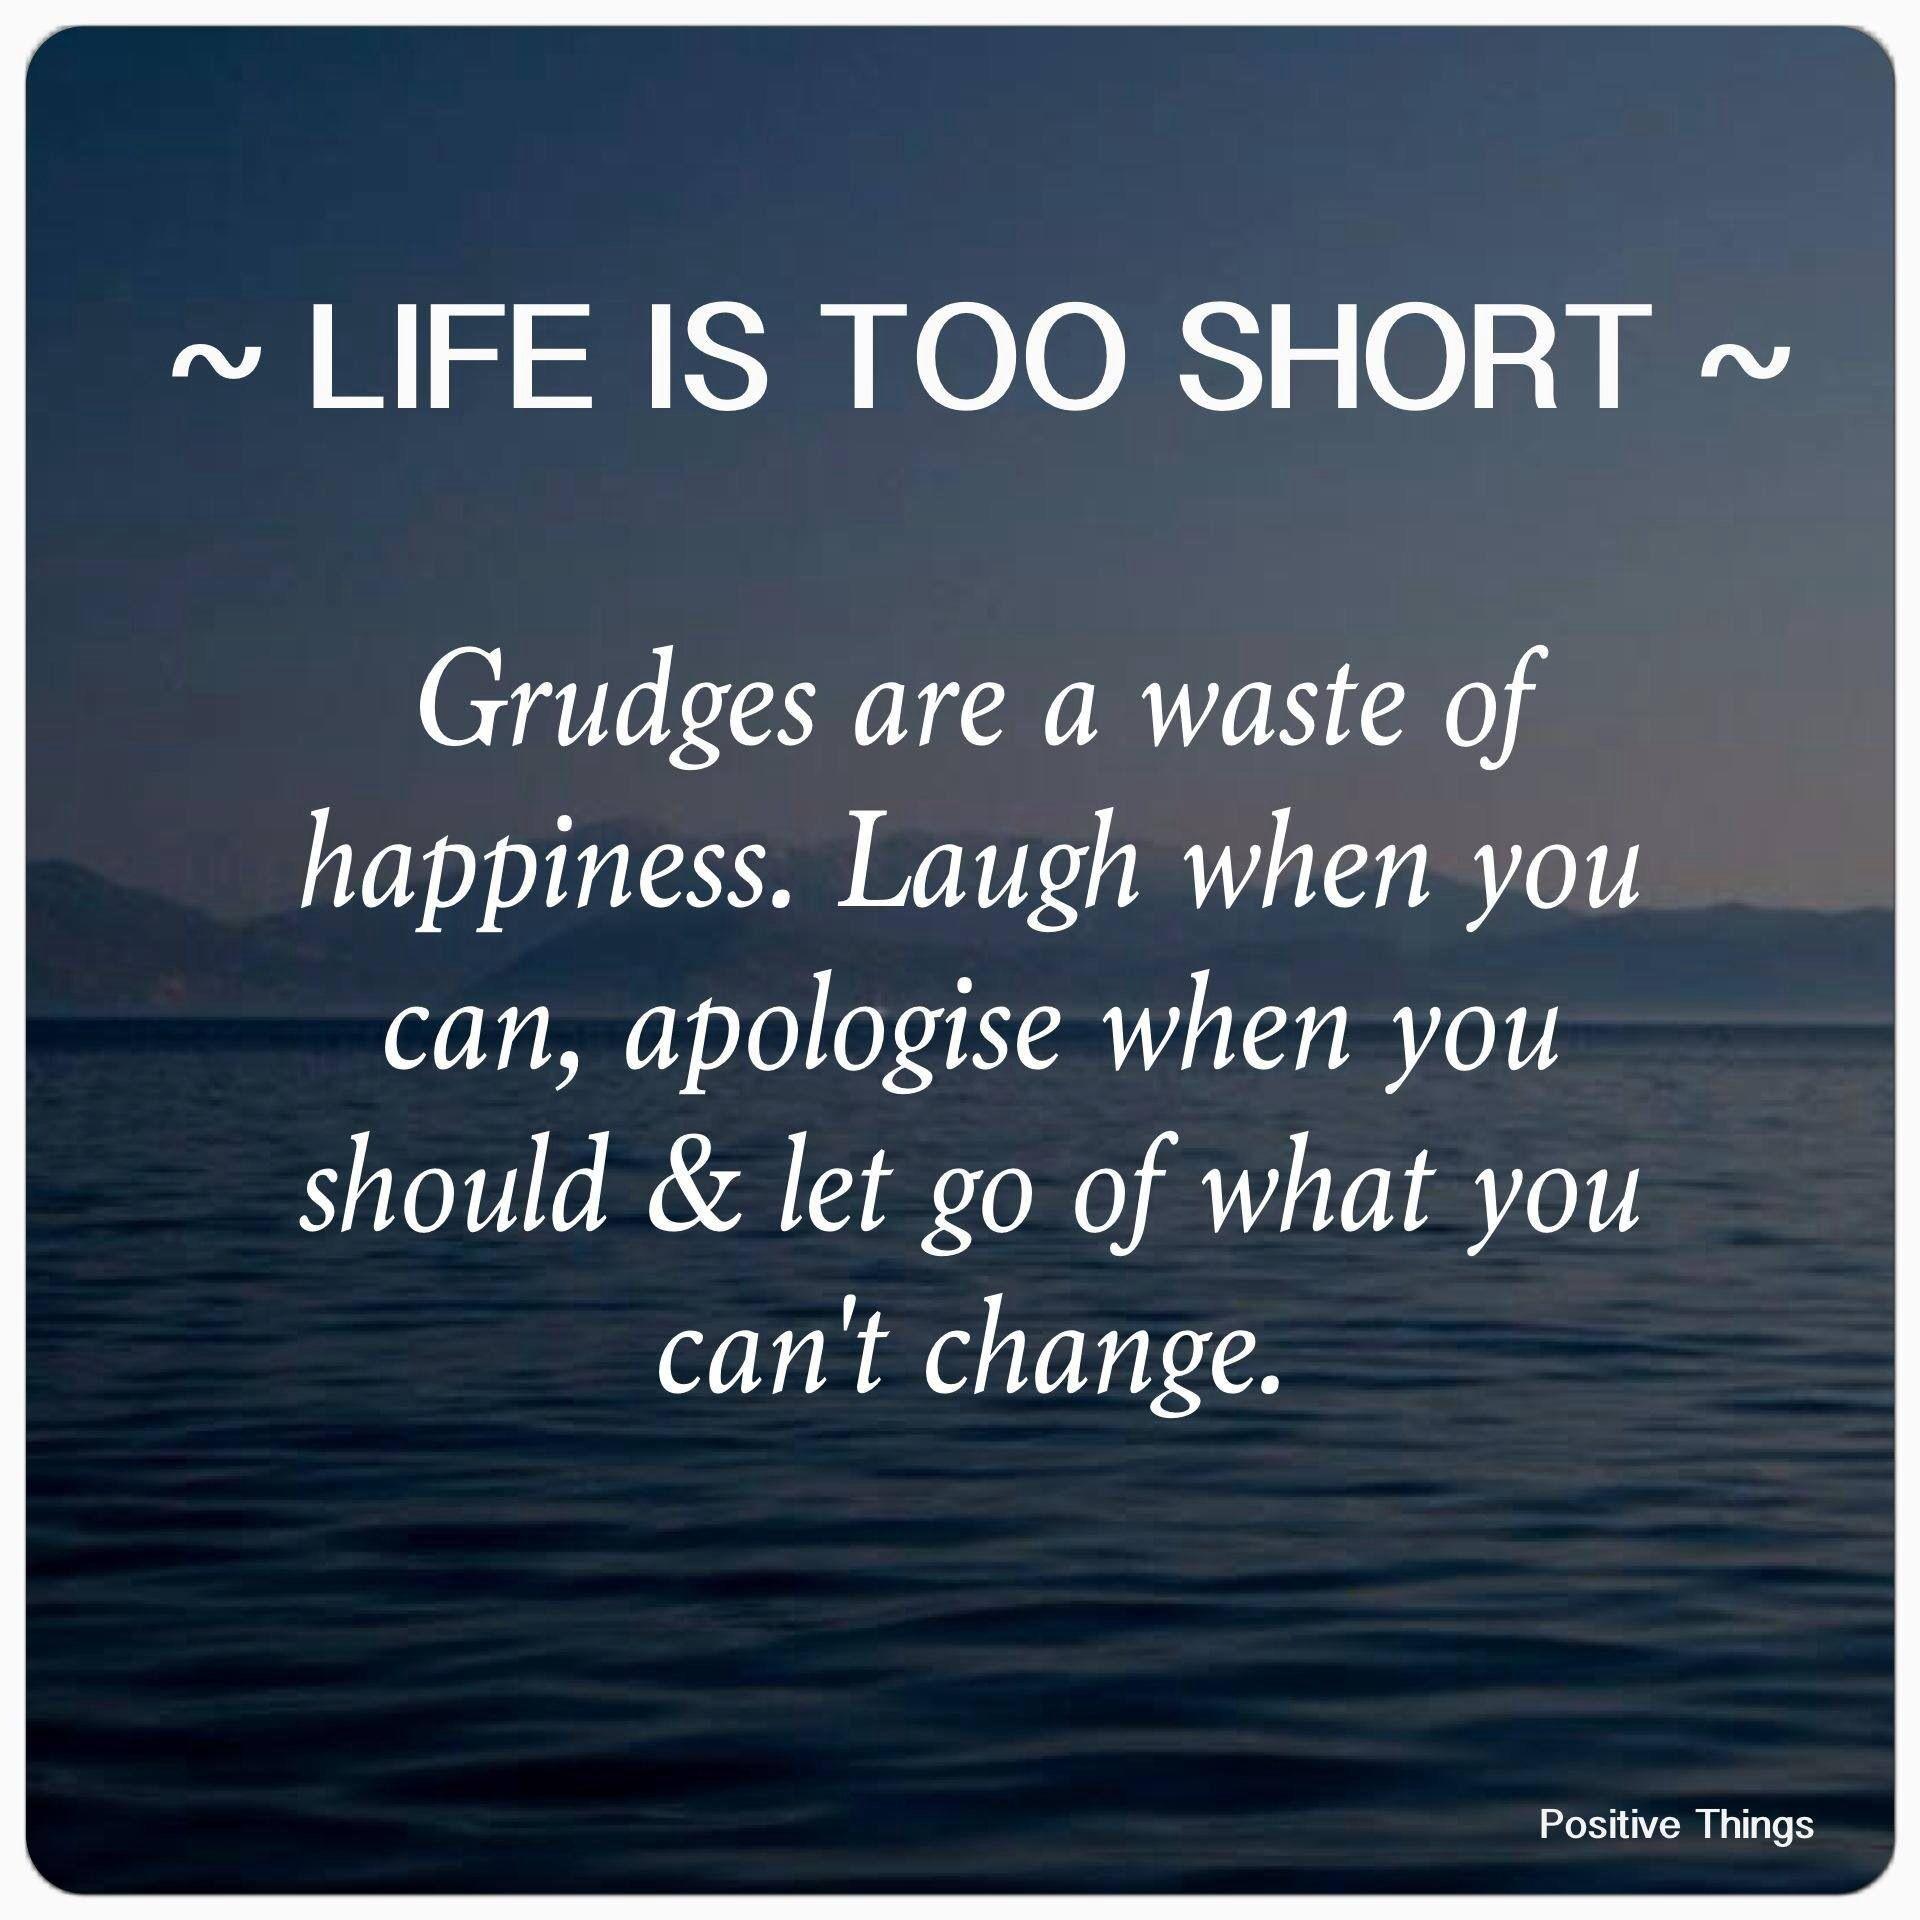 One of my favorite sayings...